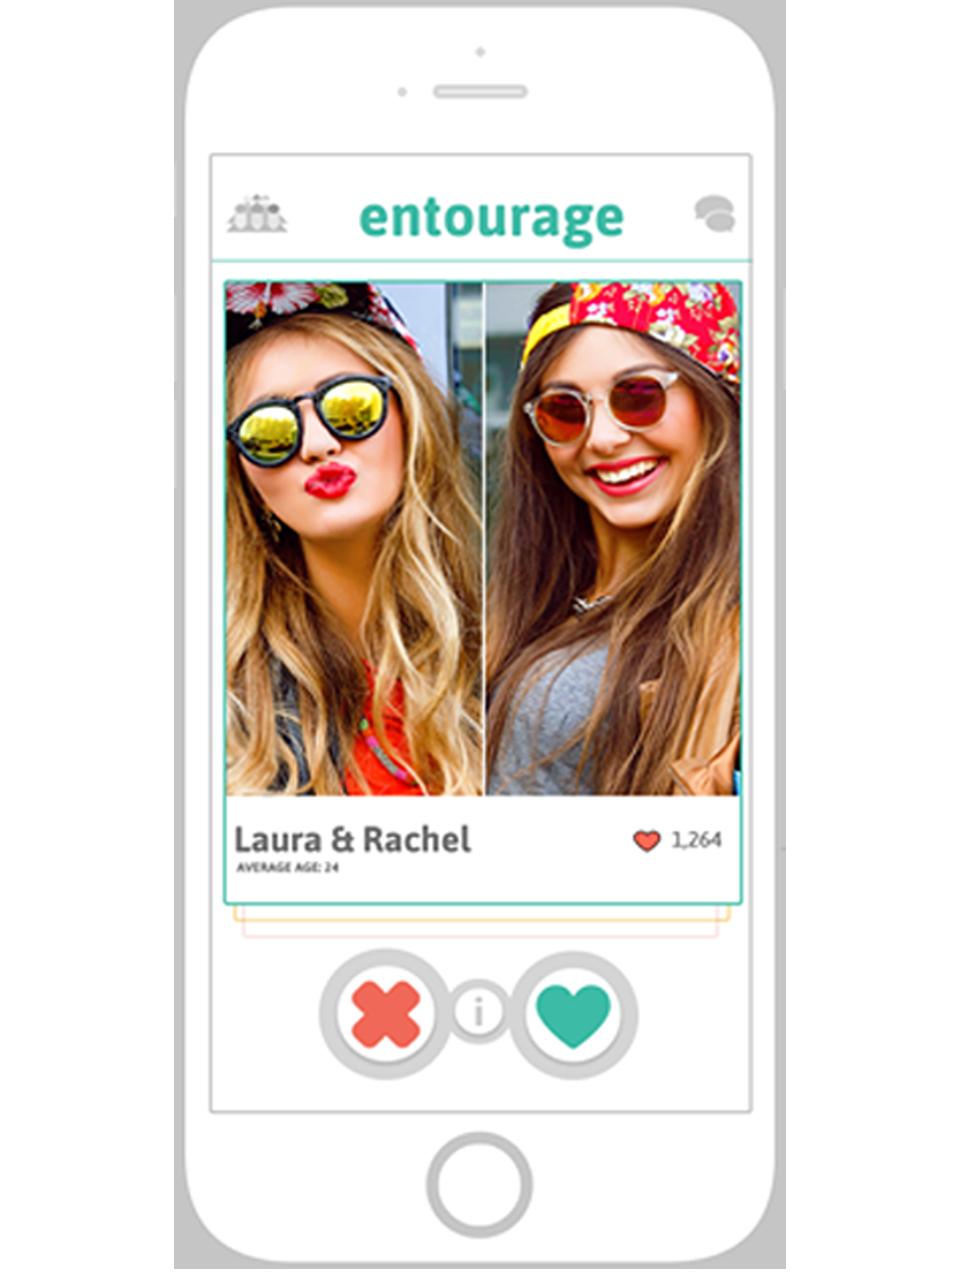 dating app case study